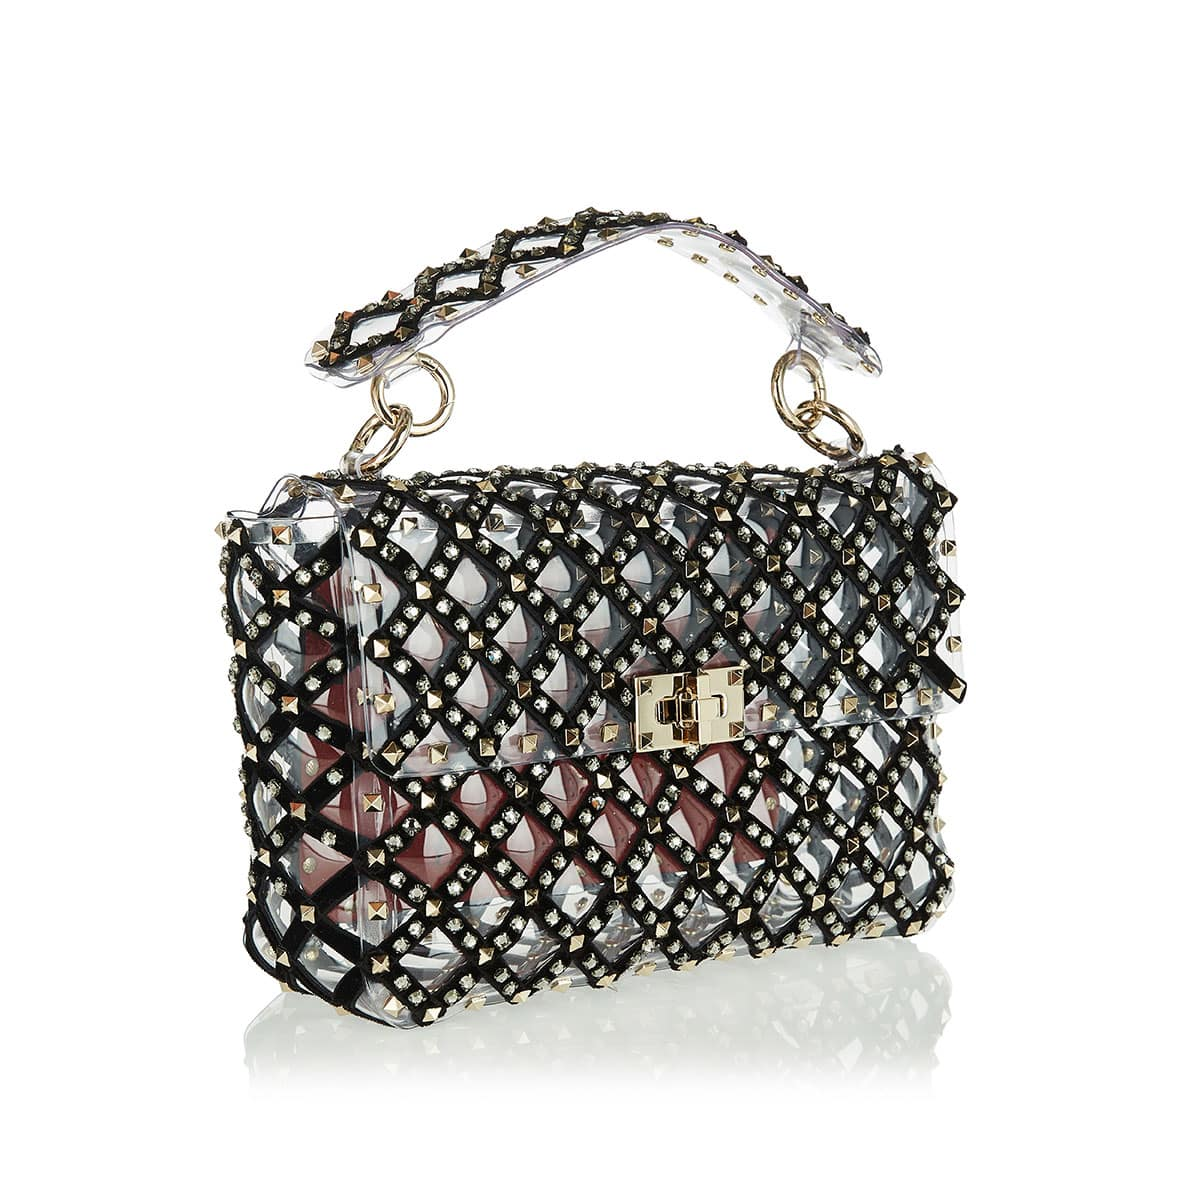 Medium Rockstud Spike.It embellished PVC bag